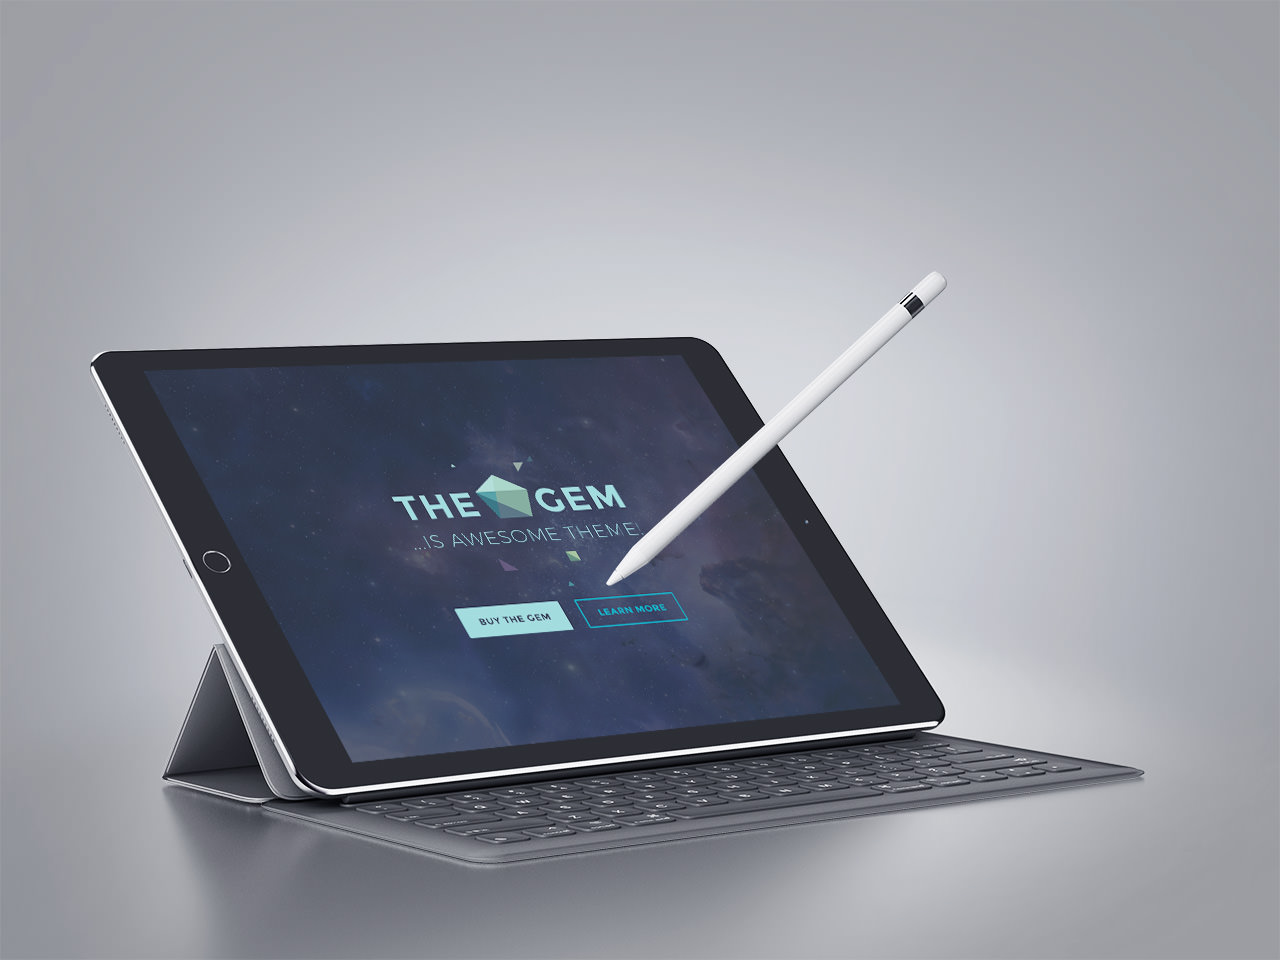 iPad Pro Smart Keyboard 1 - WIth Right Sidebar (Demo)